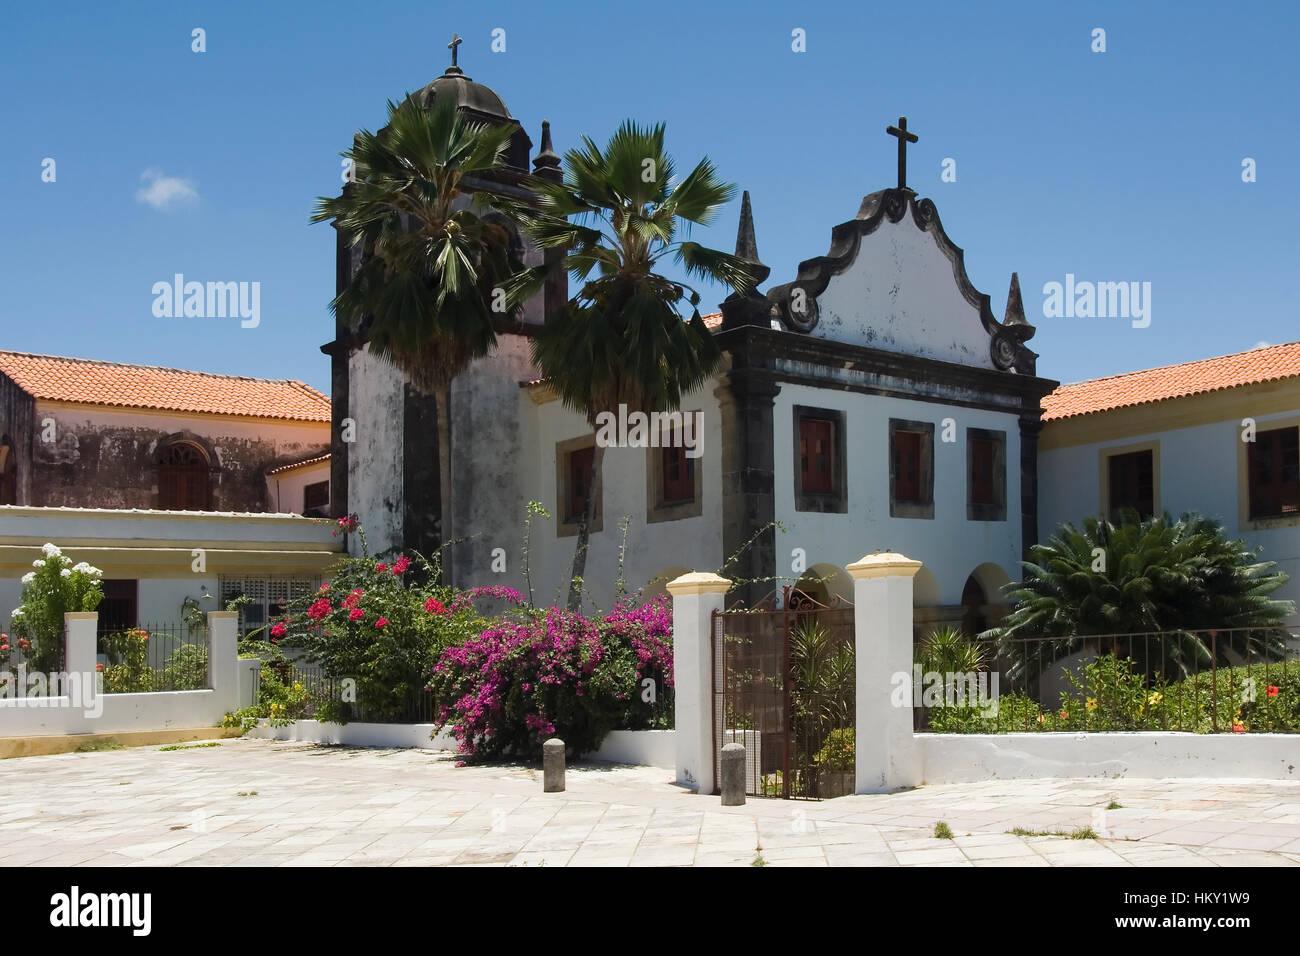 Académia Santa Gertrudes, Olinda, Pernambuco state, Brazil, UNESCO World Heritage Site Académie Santa - Stock Image